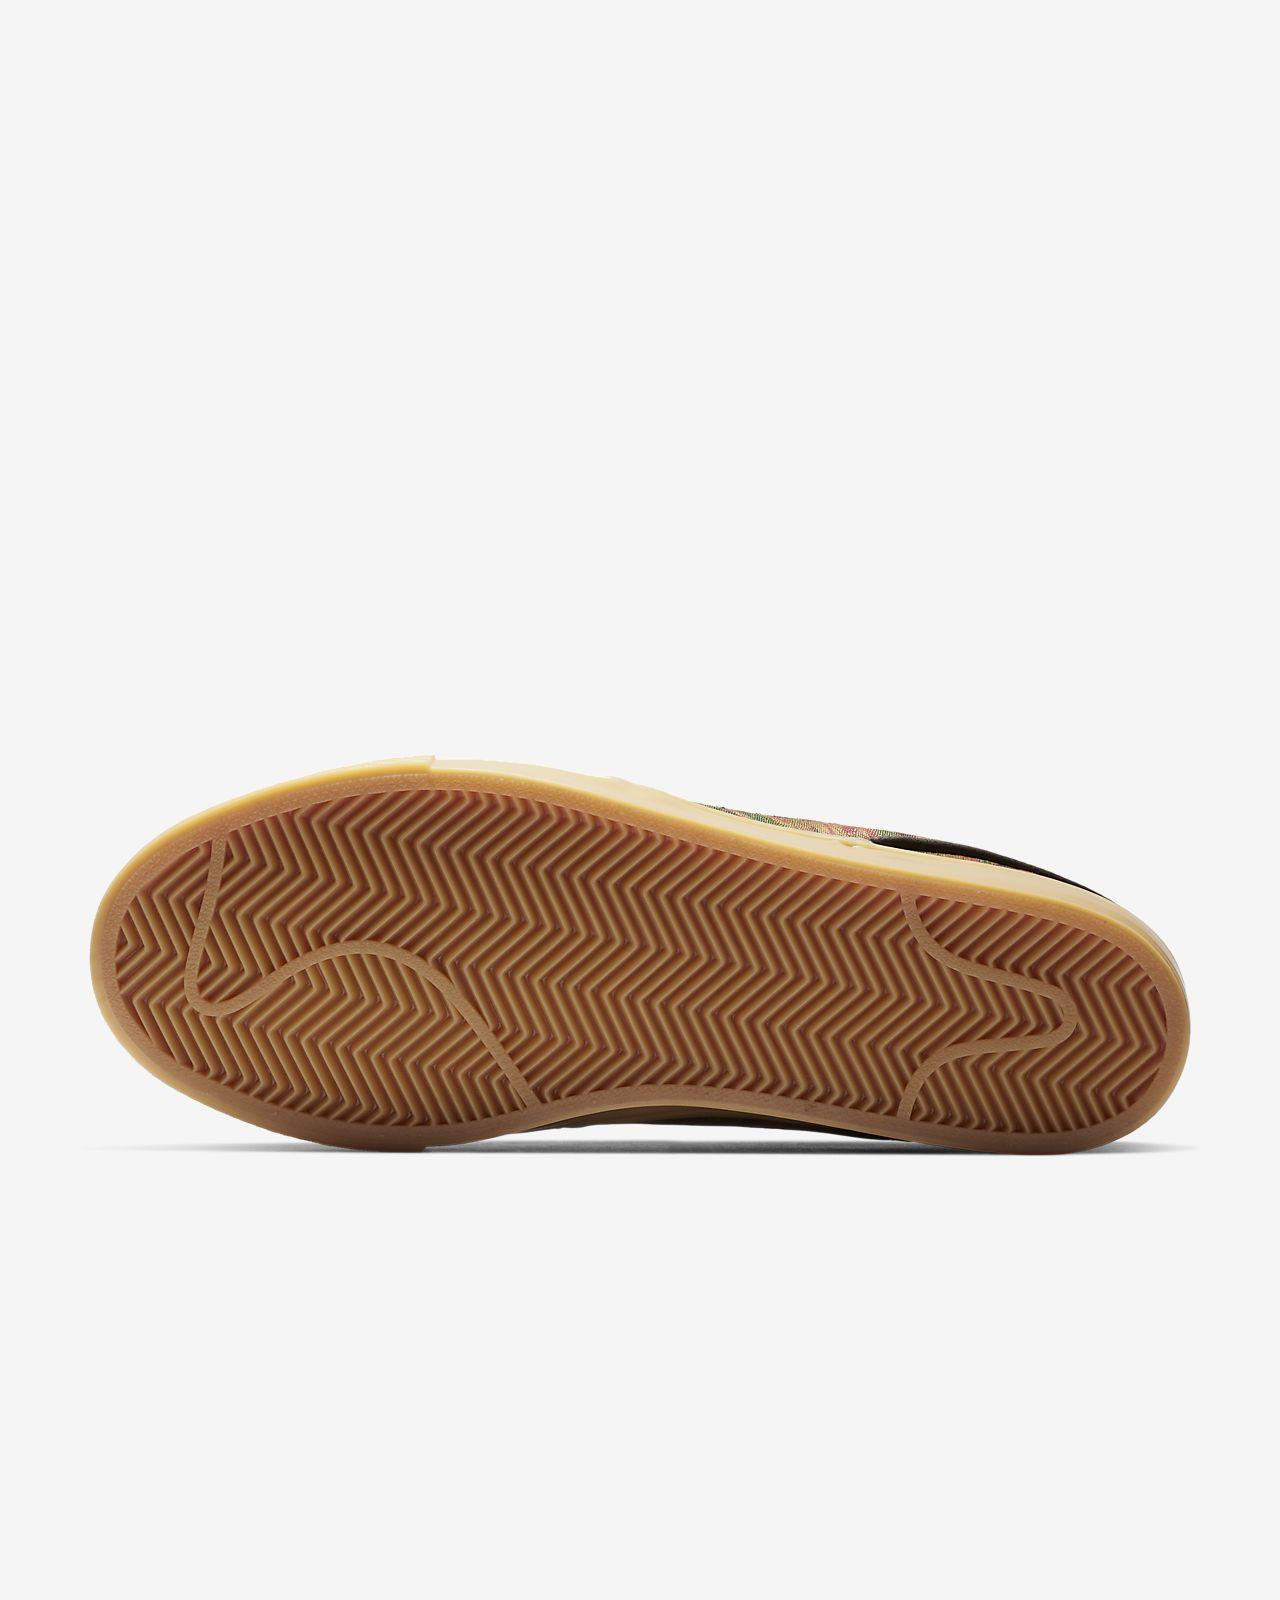 finest selection a4202 4761b ... Nike SB Zoom Stefan Janoski Canvas Premium Men s Skateboarding Shoe